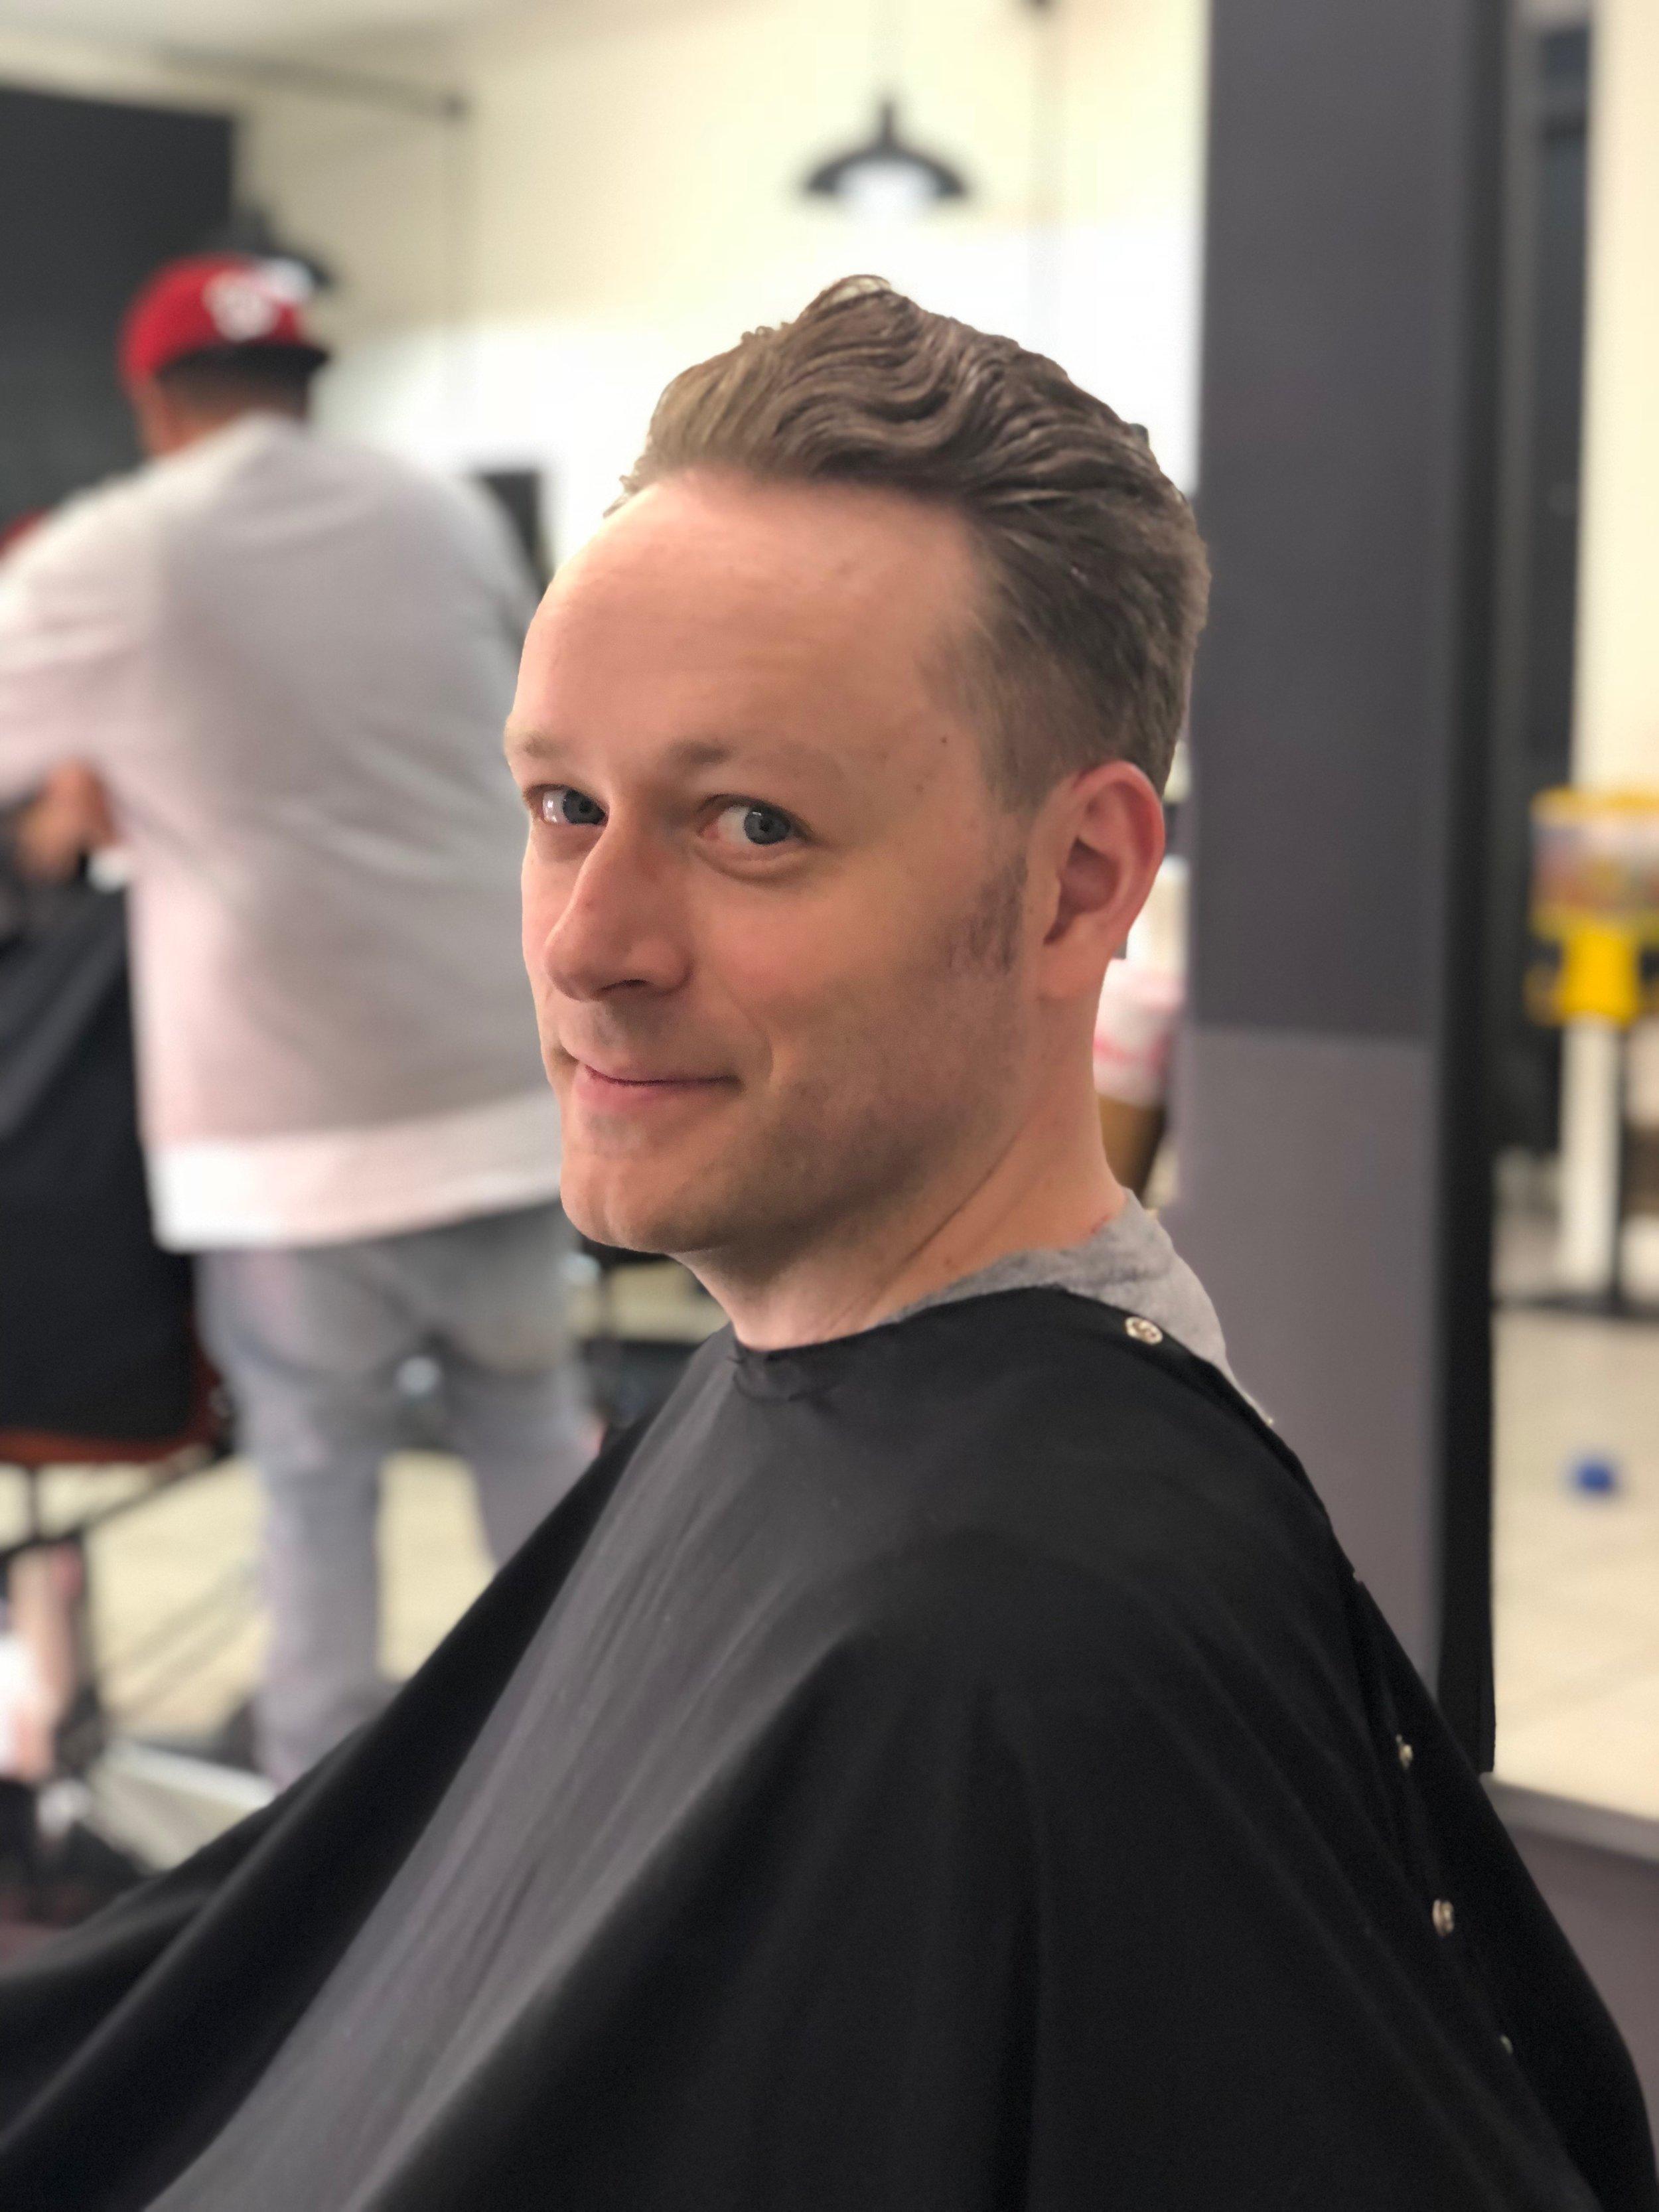 Men S Haircuts Walk Ins Welcome Salt Lake City Kraken Barber Shop Midvale